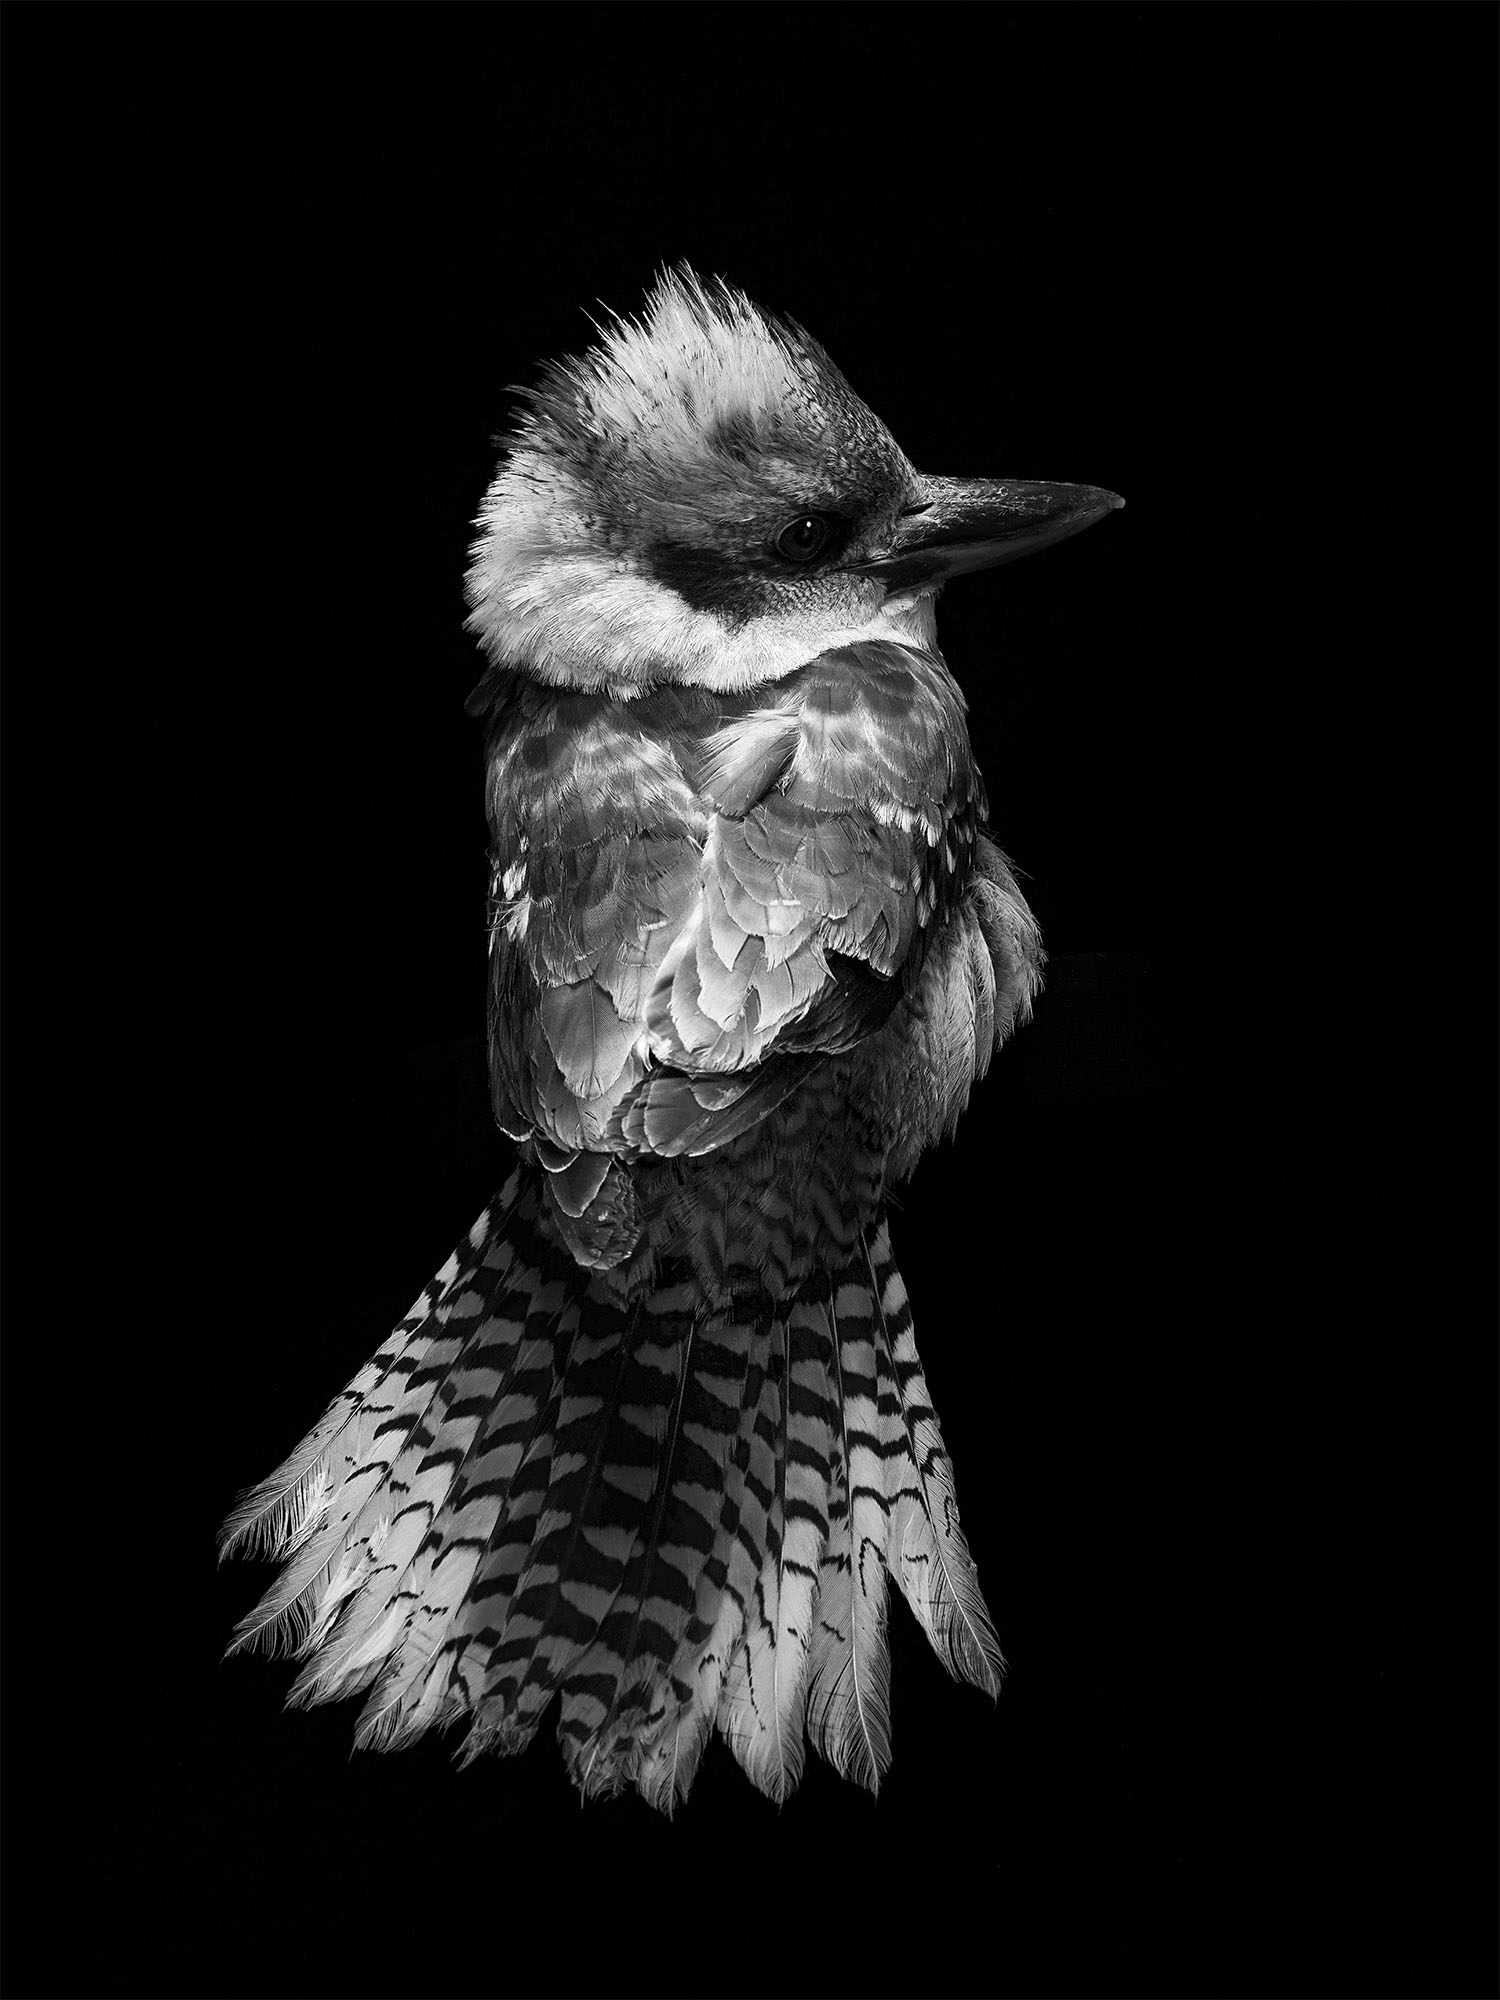 laughing-Kookaburra-gary-heery-print.jpg